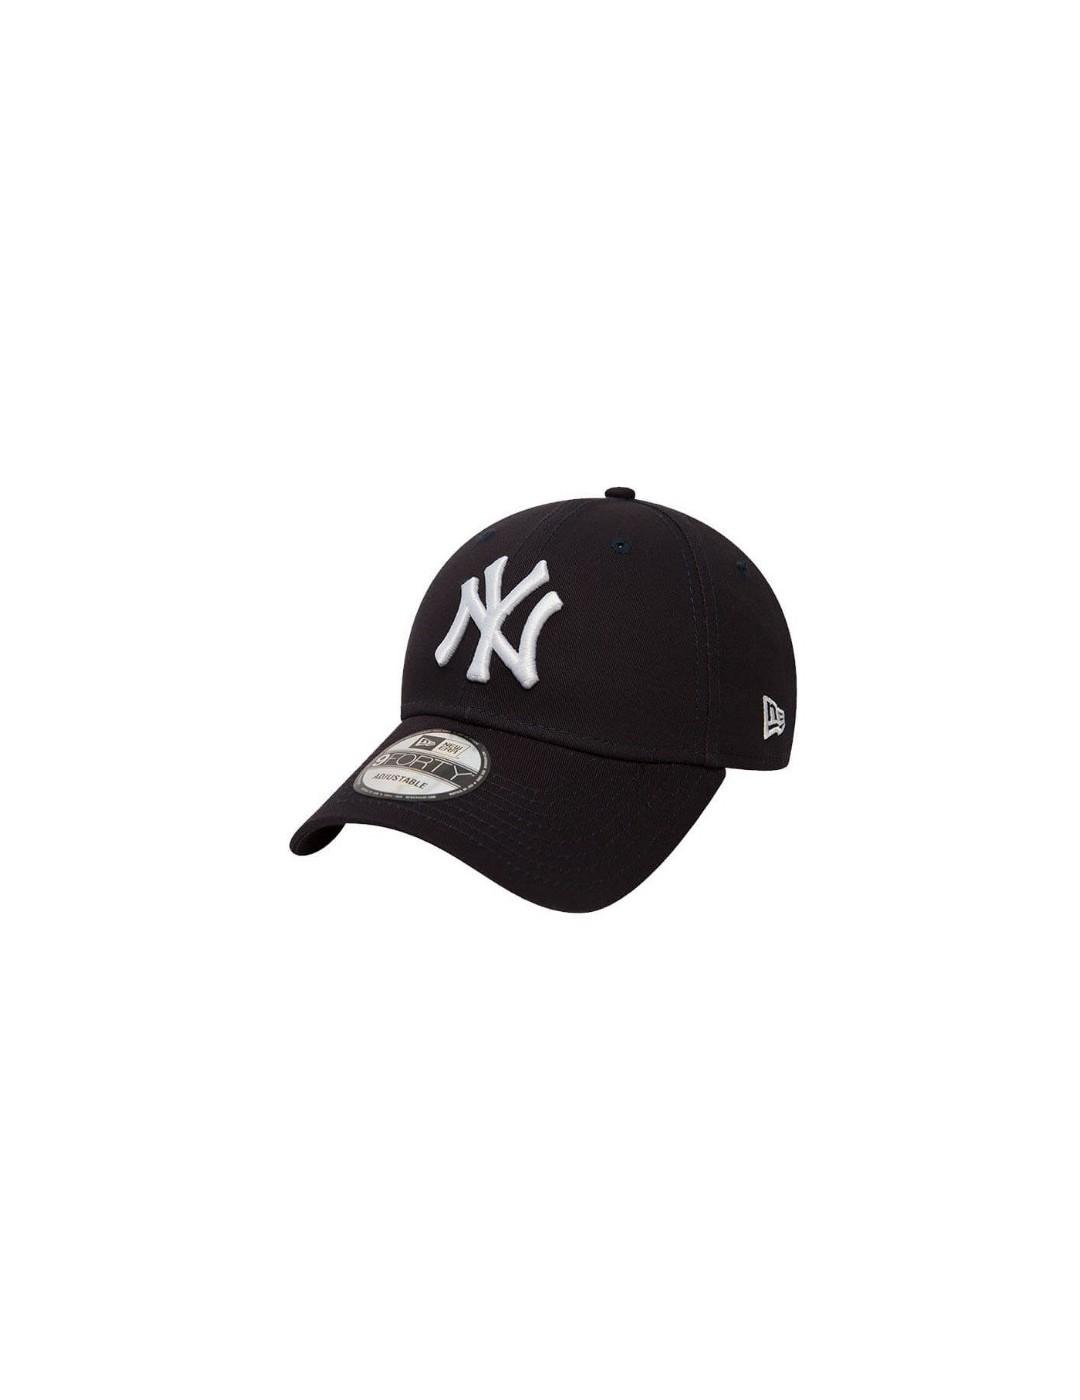 GORRA NEW ERA NEW YORK YANKIES BLACK